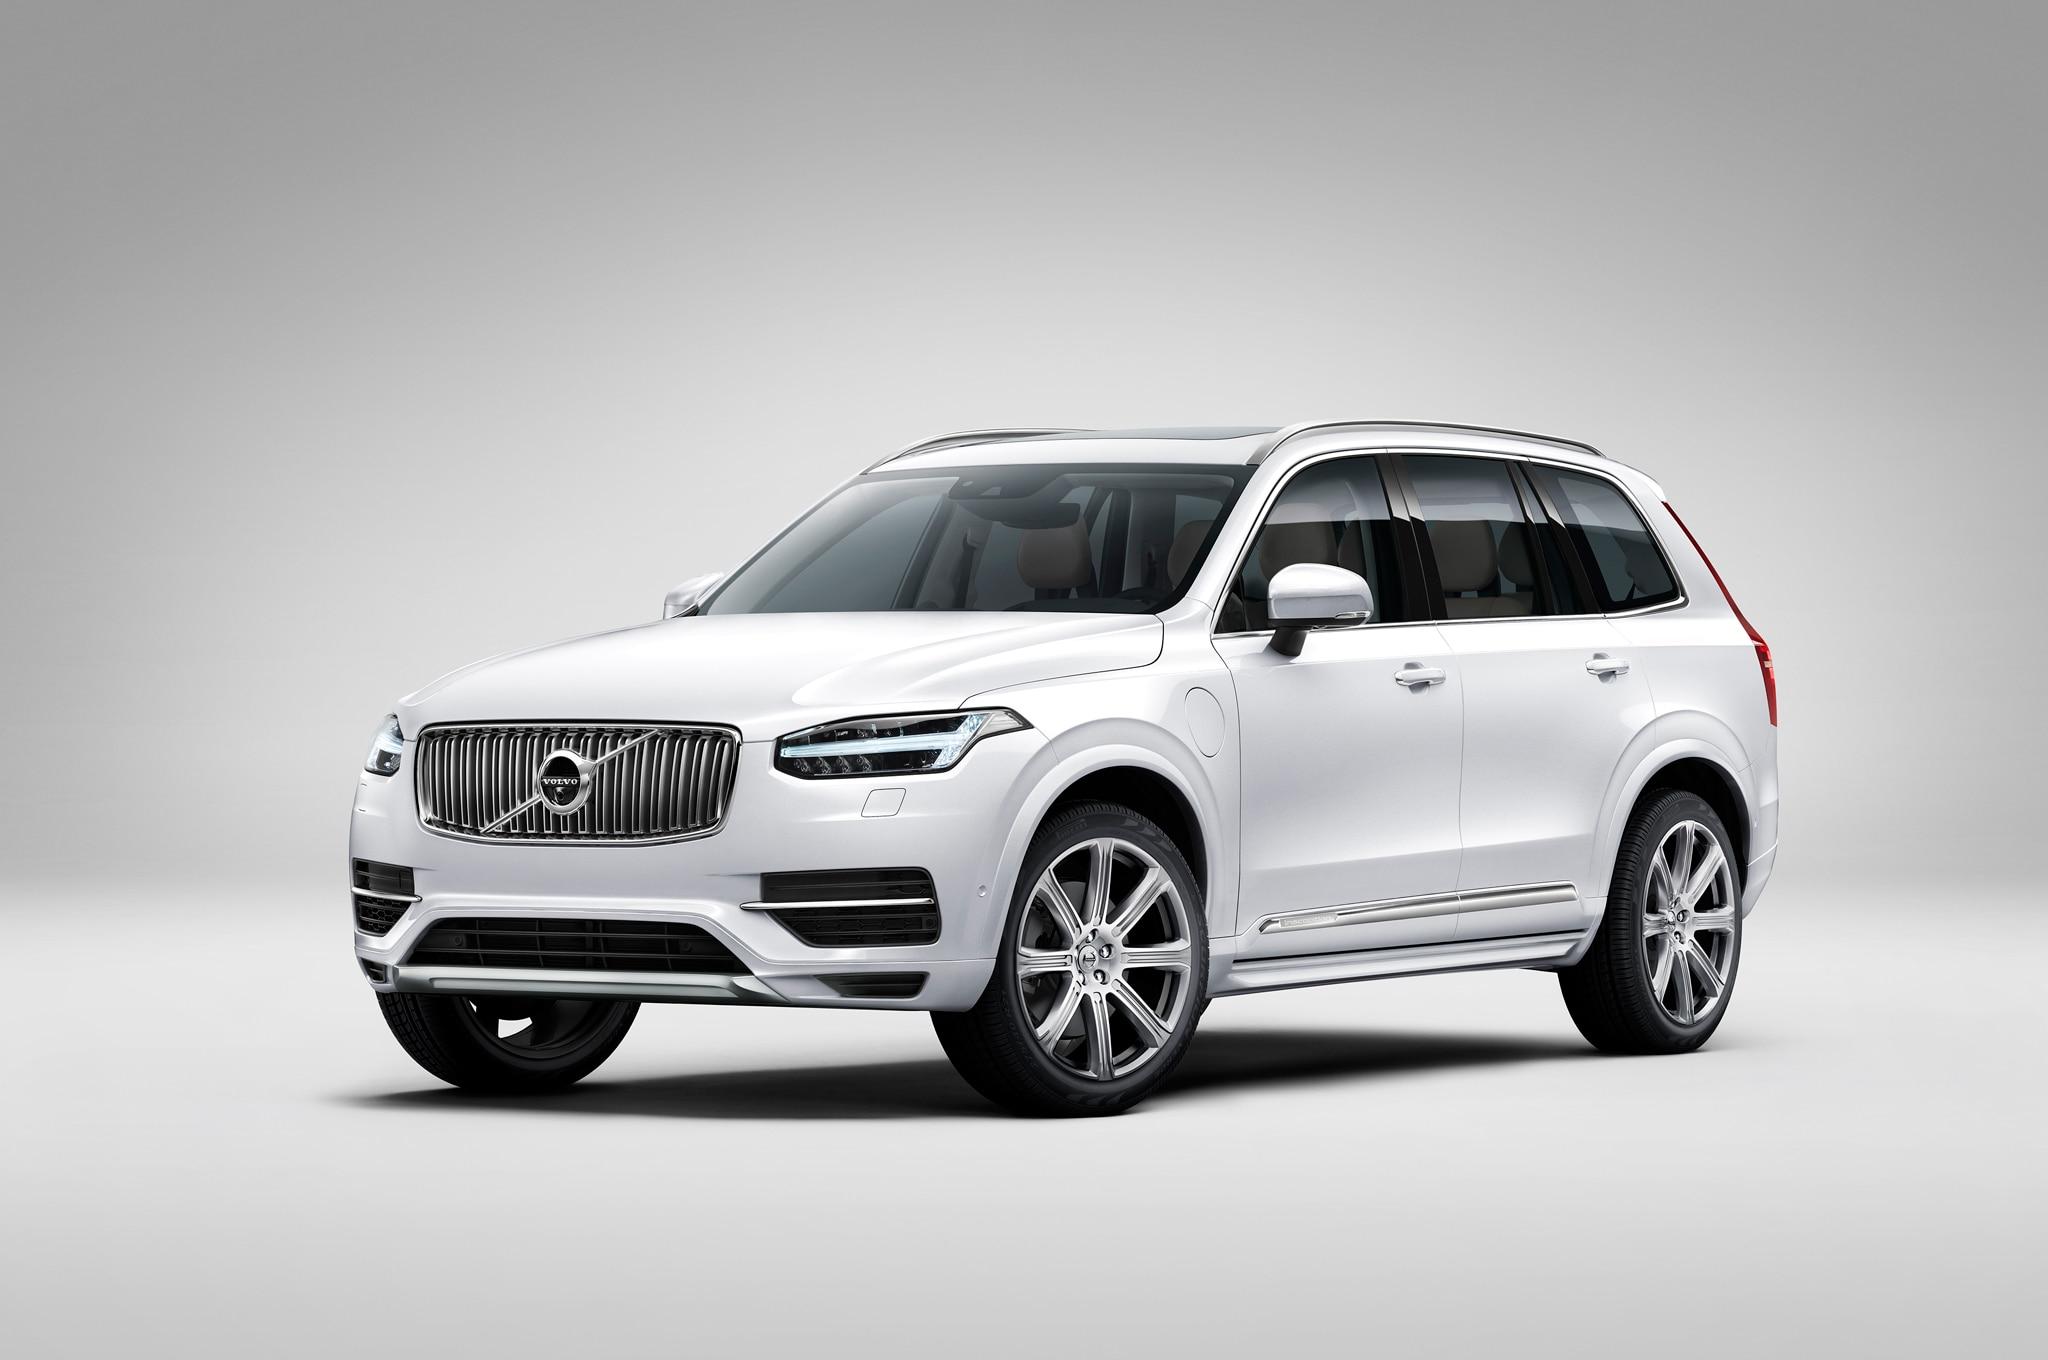 2016 Volvo XC90: First Drive - Autoweb